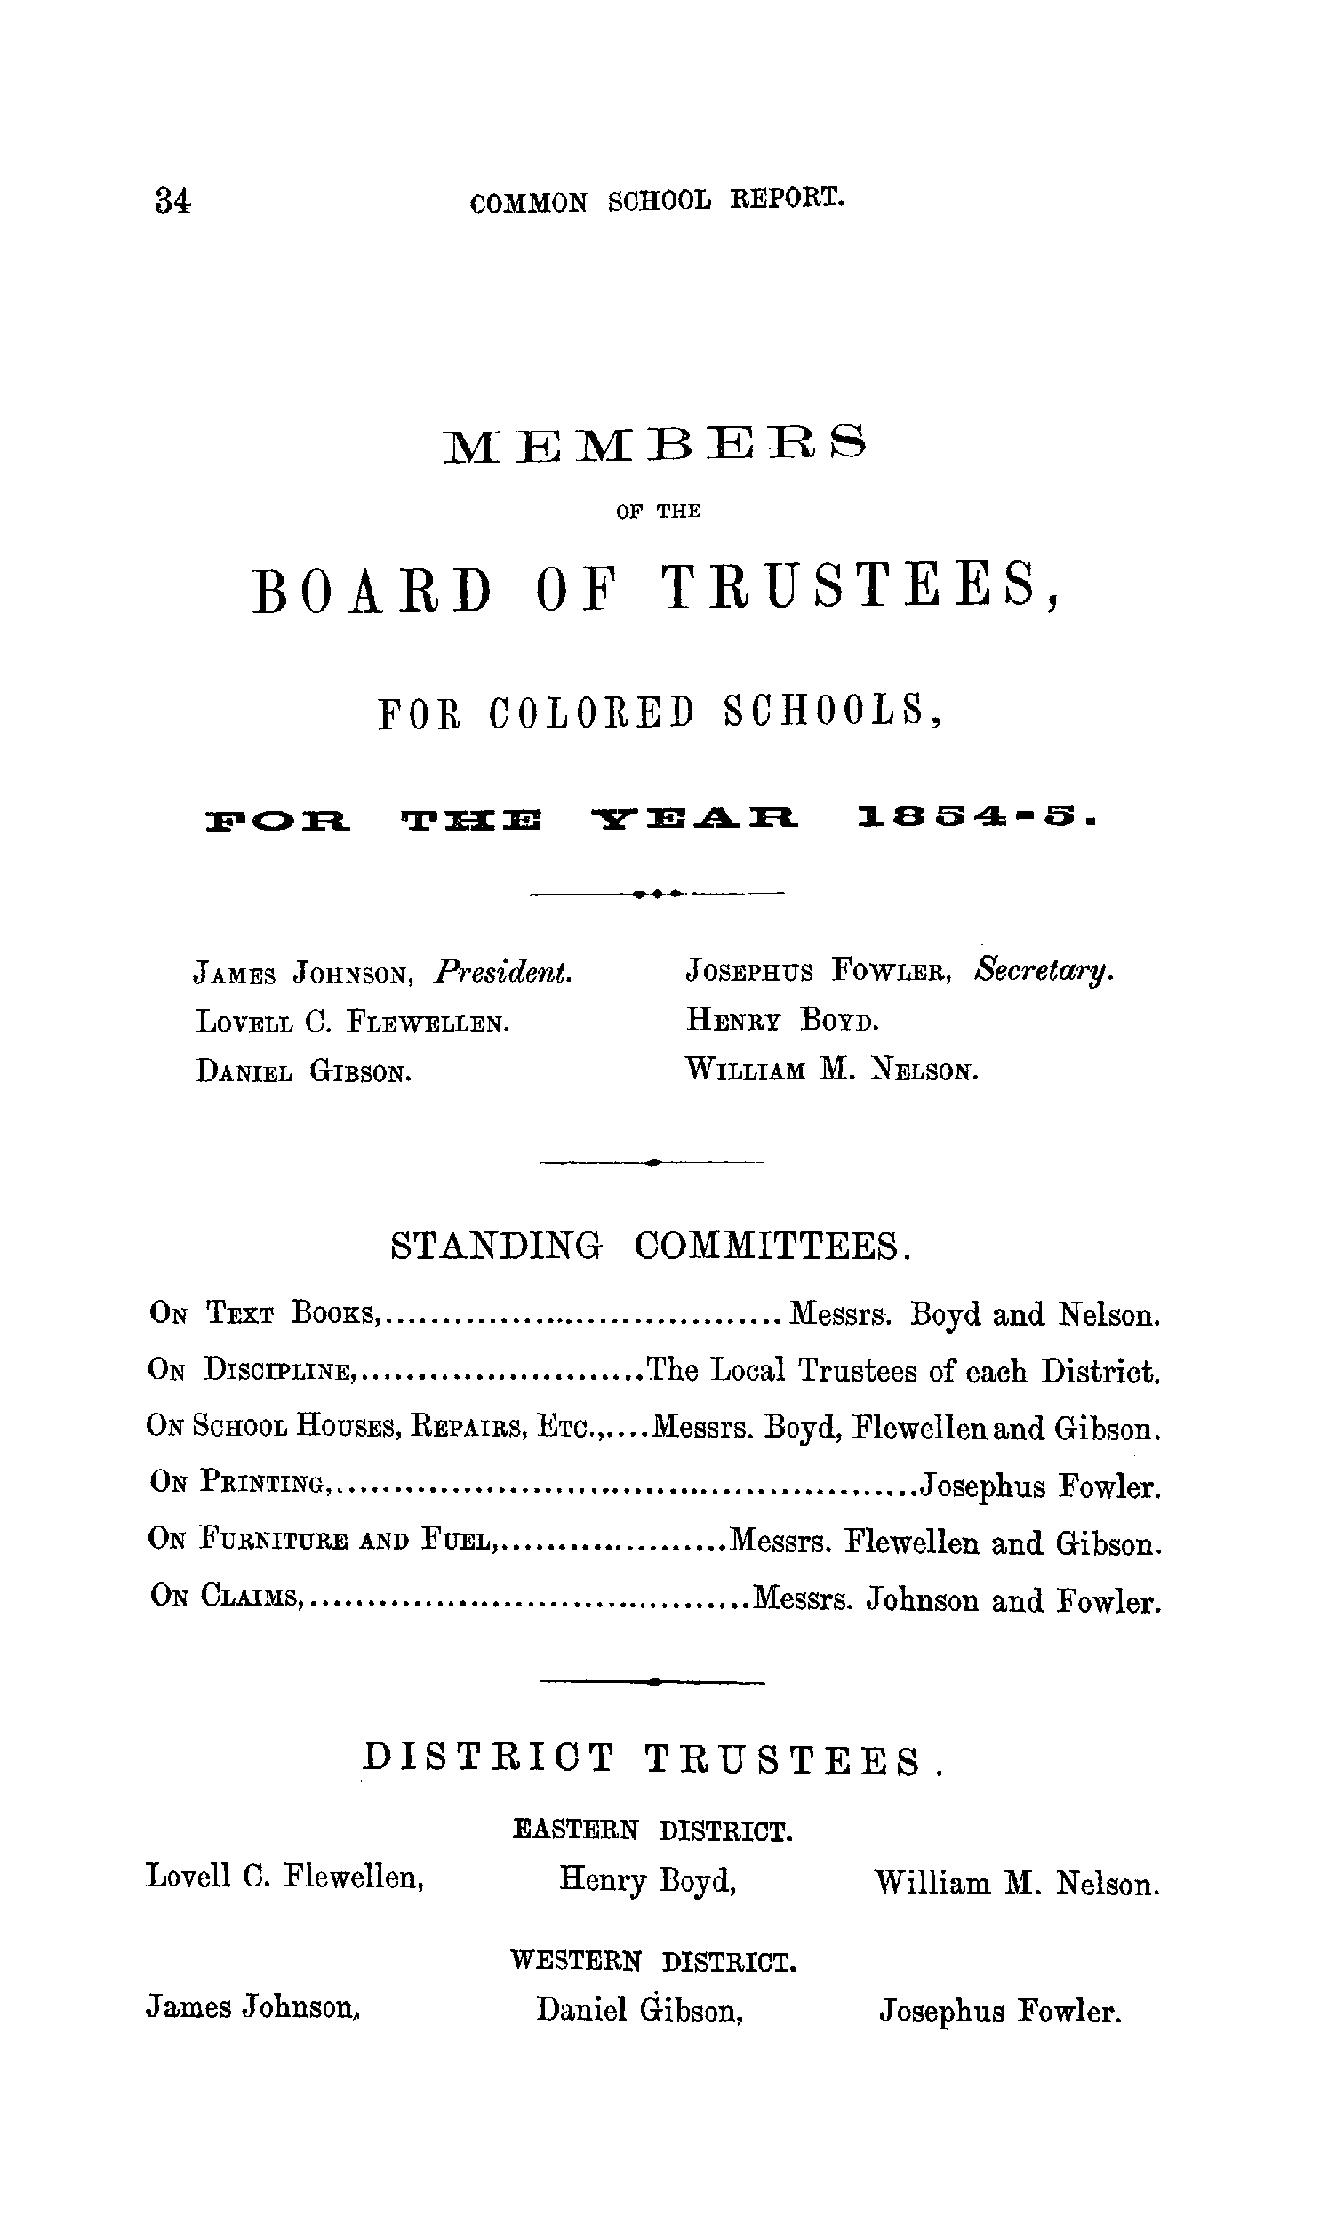 Annual report of the Board of Trustees for the Colored Public Schools of Cincinnati [1855-1871/72]. https://digital.cincinnatilibrary.org/digital/collection/p16998coll15/id/148179/rec/3